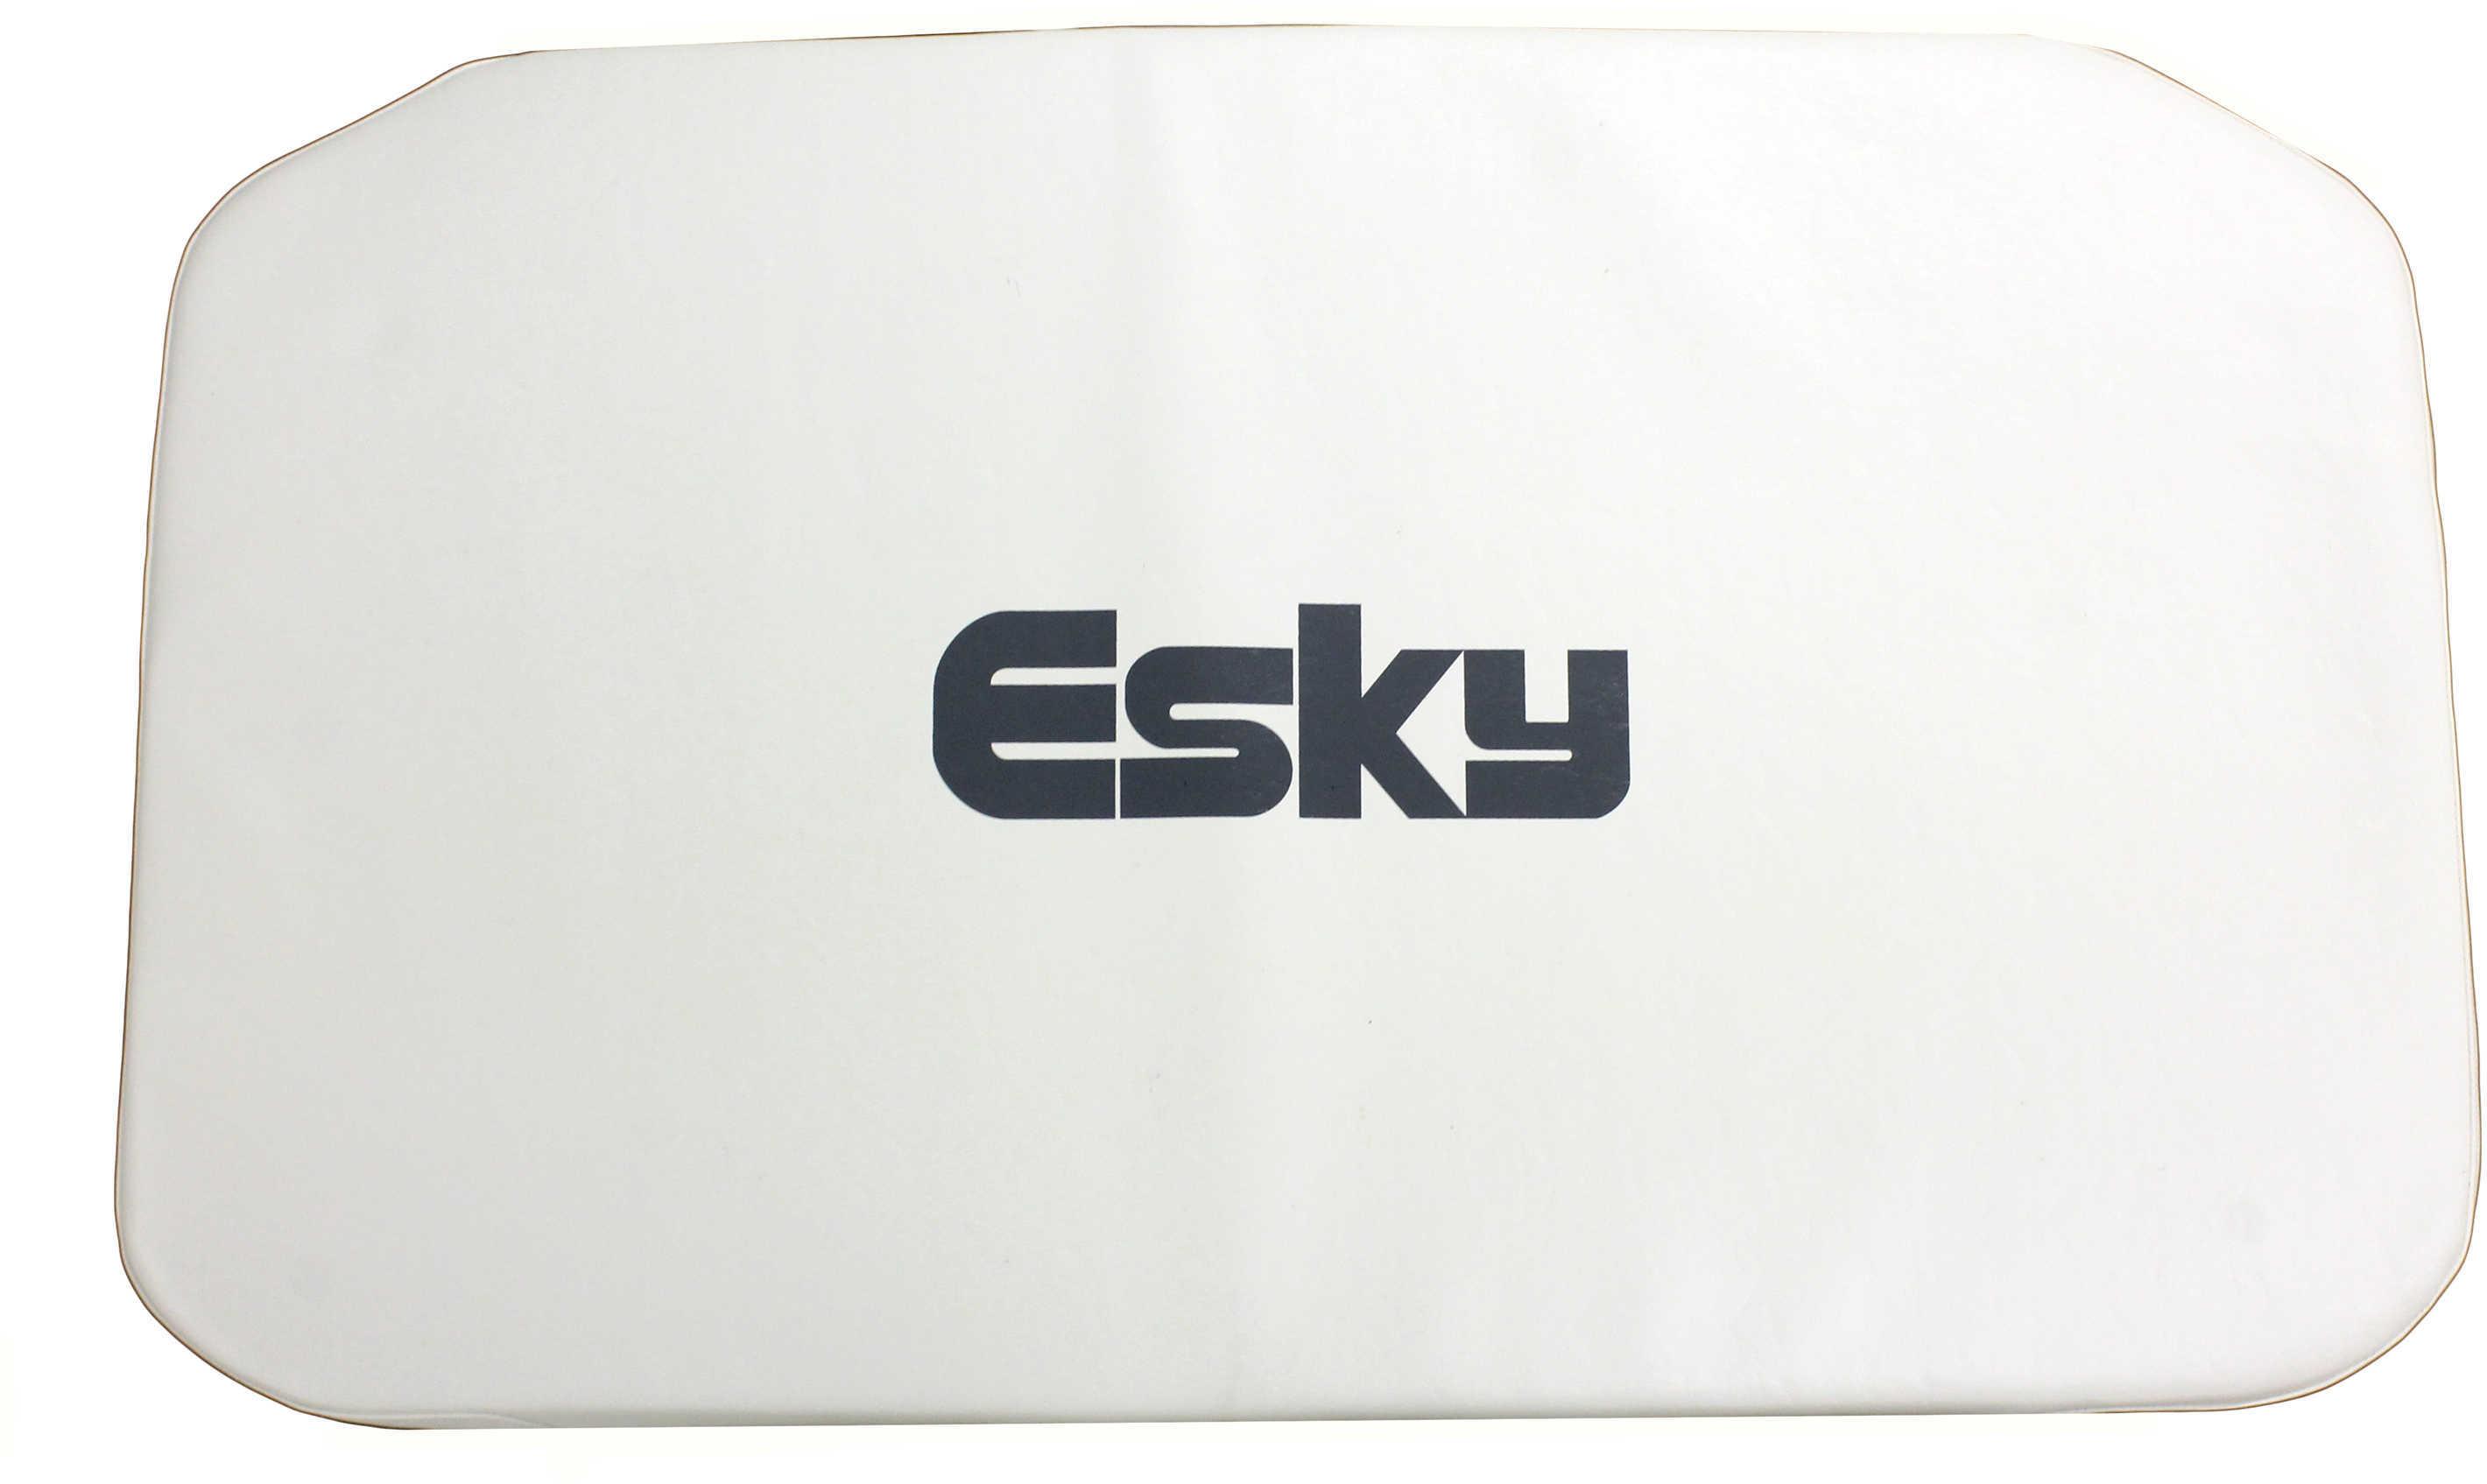 Coleman Esky Cushion Series Cooler 85 Quart, White Md: 3000004108